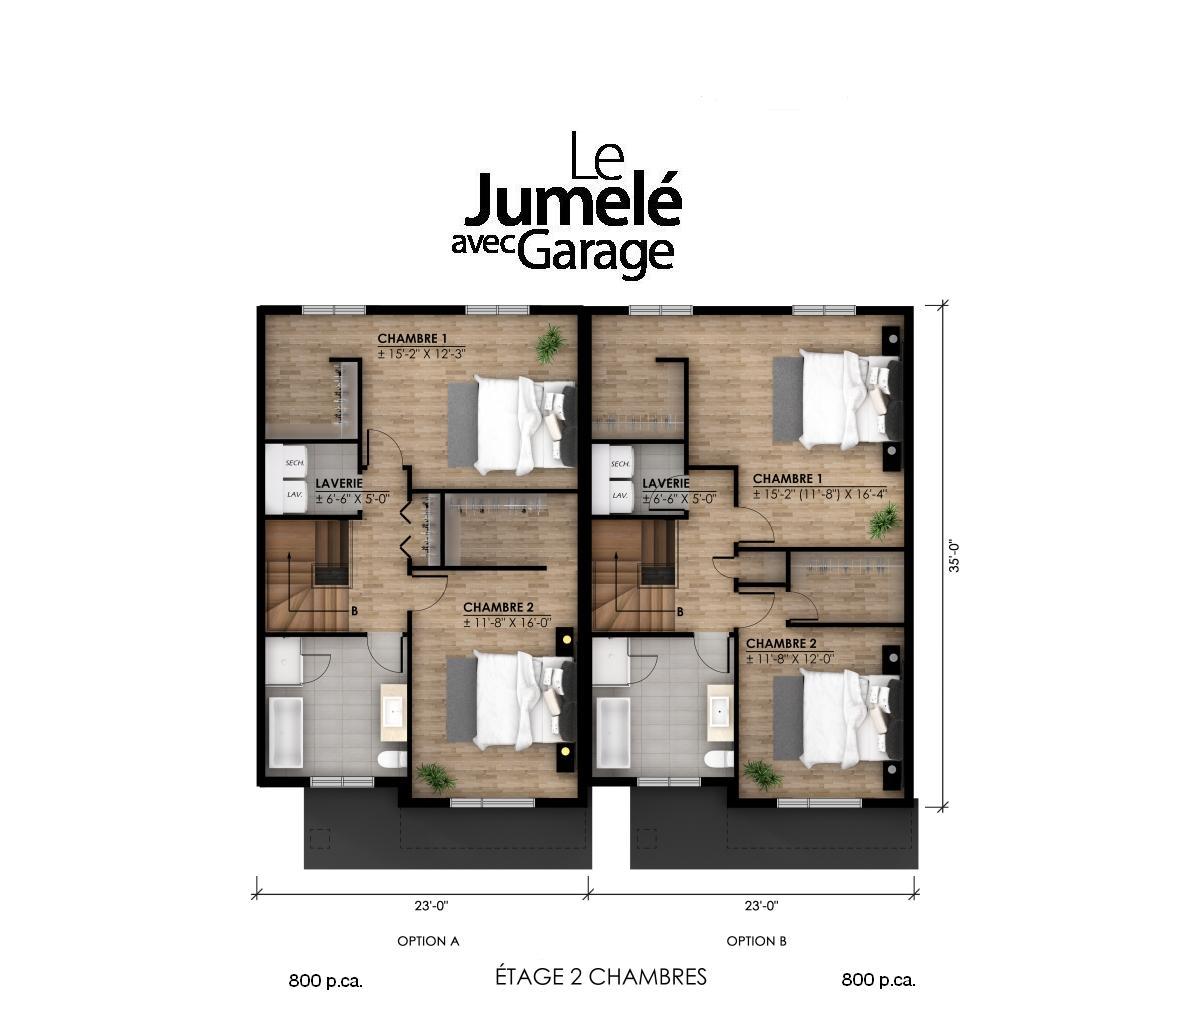 plan garage étage 2 ch. pi2